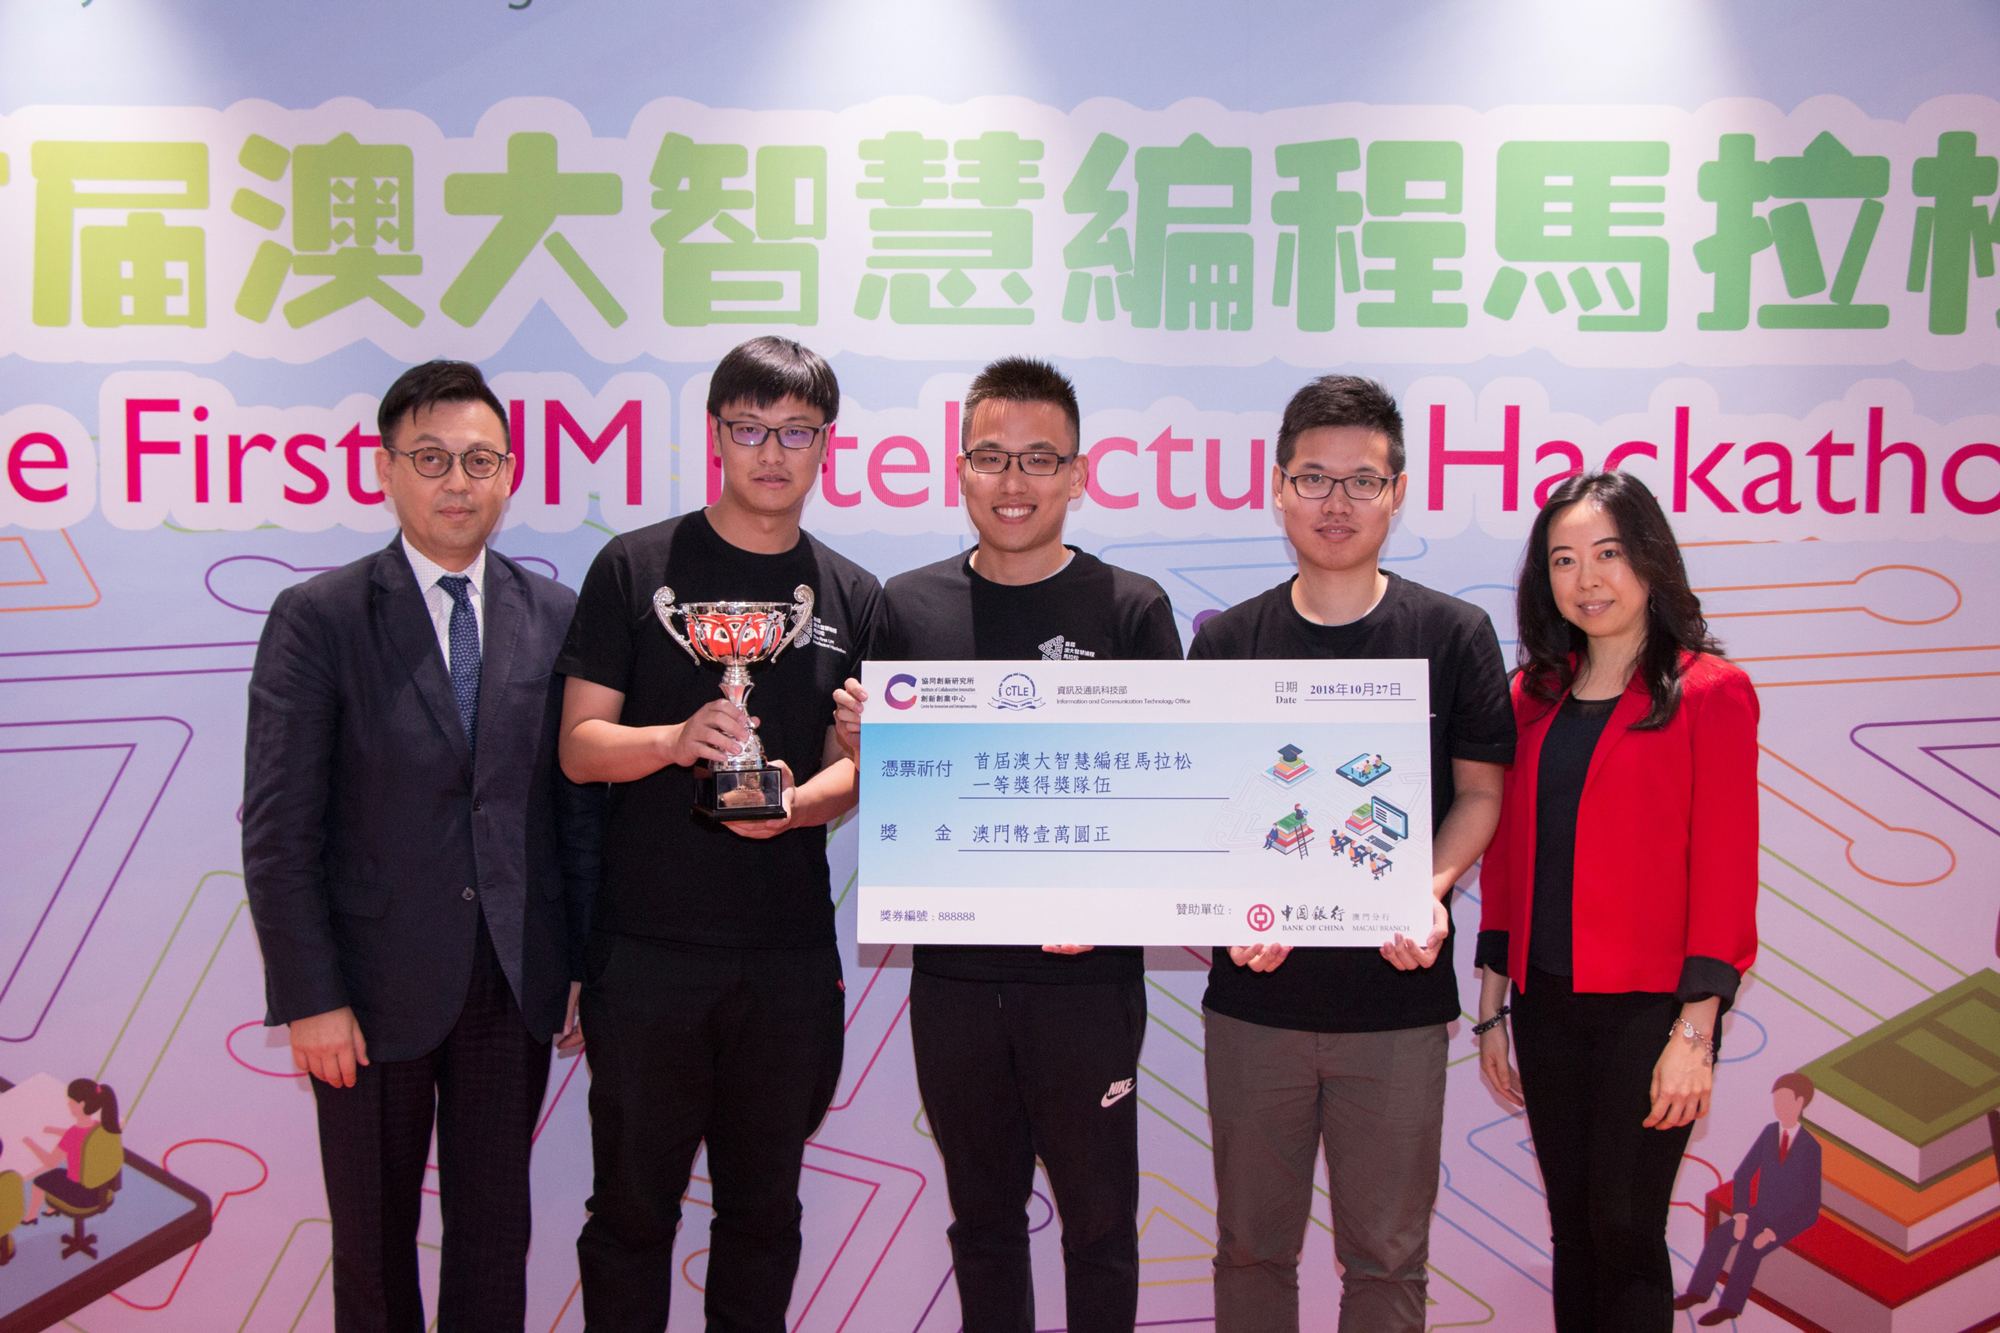 Team 'DDG' wins a first prize